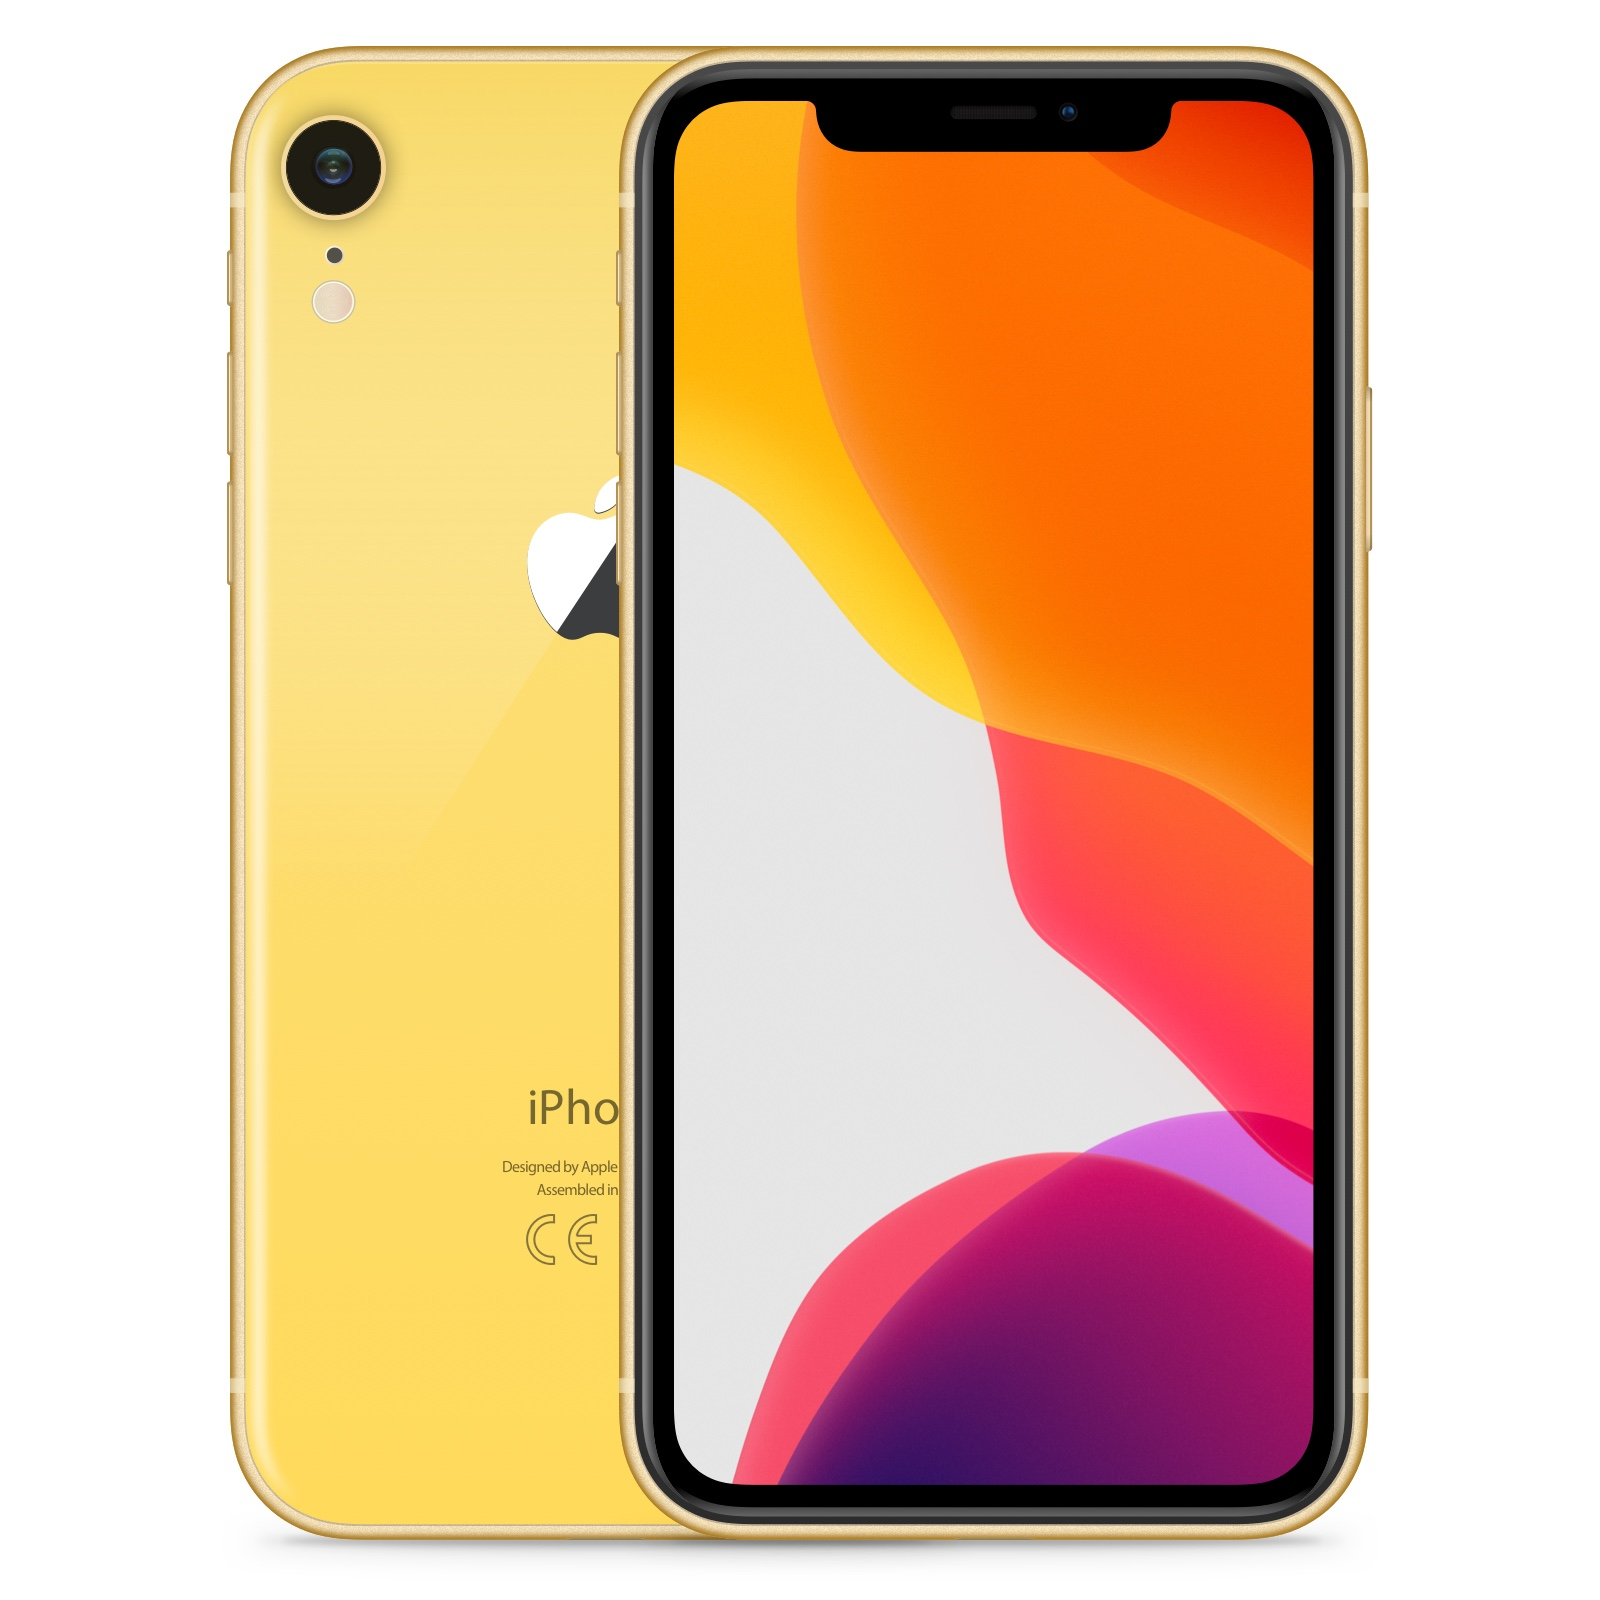 IPHONE XR 64 GB YELLOW